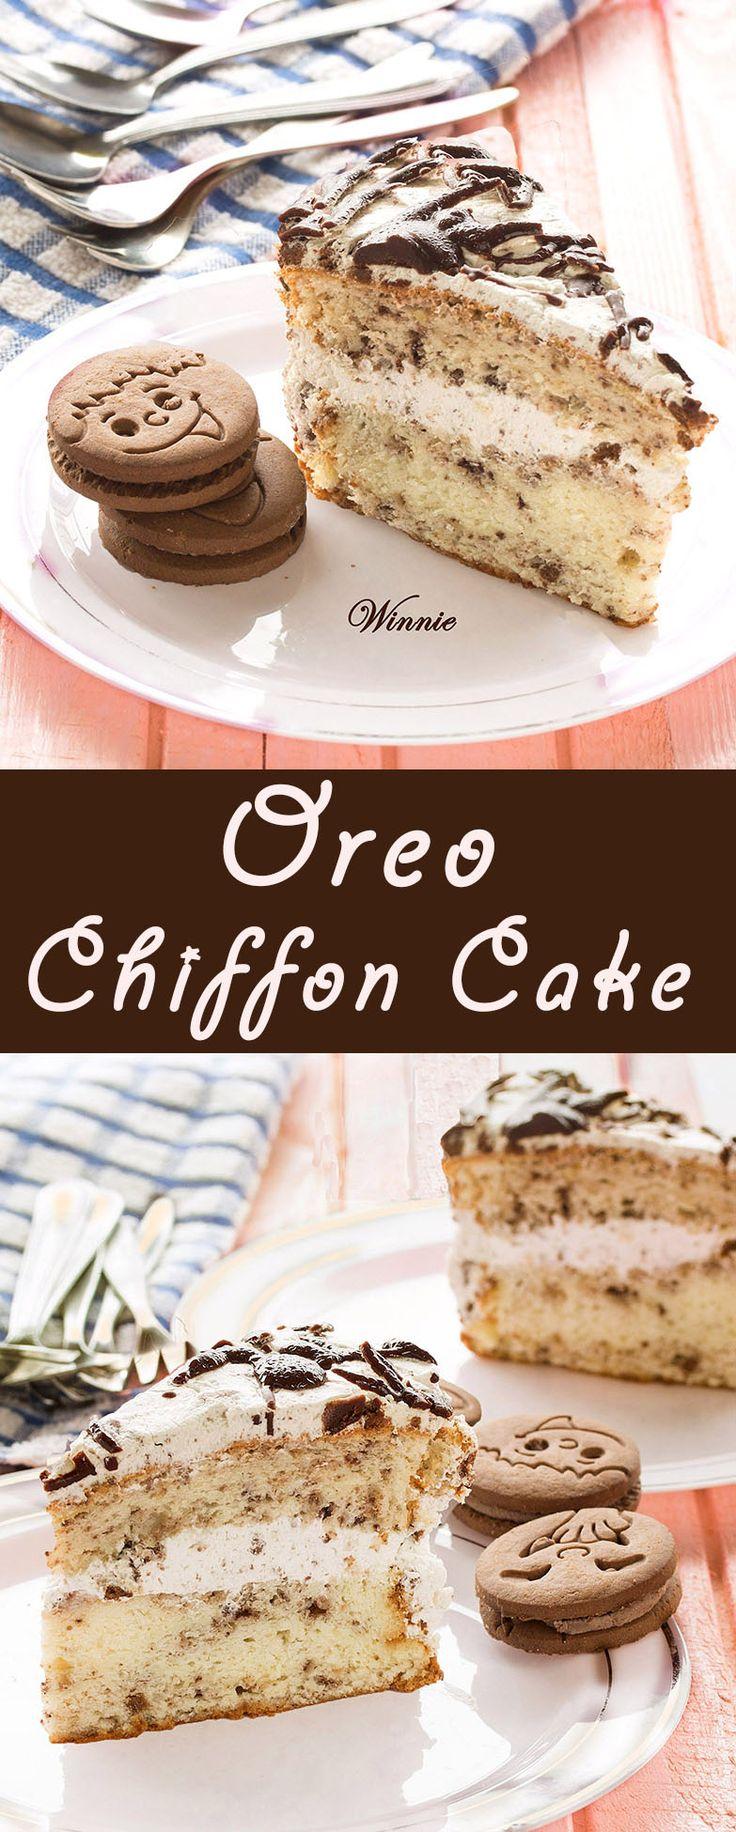 ... Of Cake on Pinterest | Chocolate cakes, Poke cakes and Banana cakes